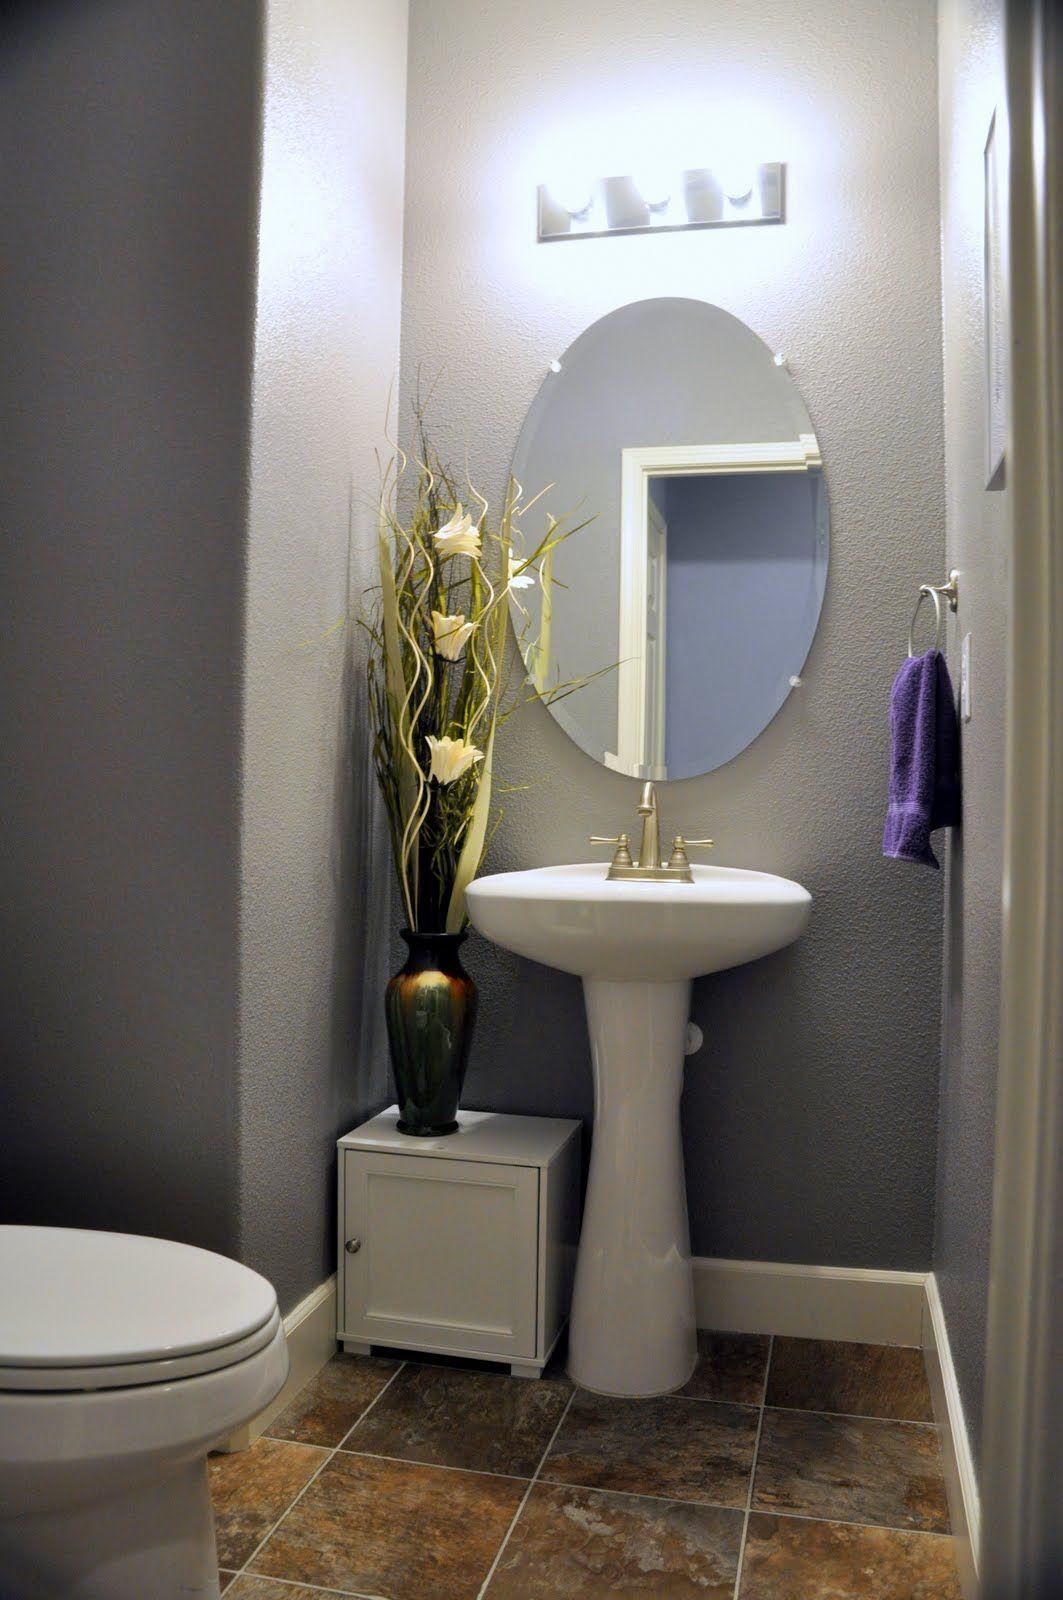 Pedestal Sink Bathroom Designs Google Search Powder Room Small